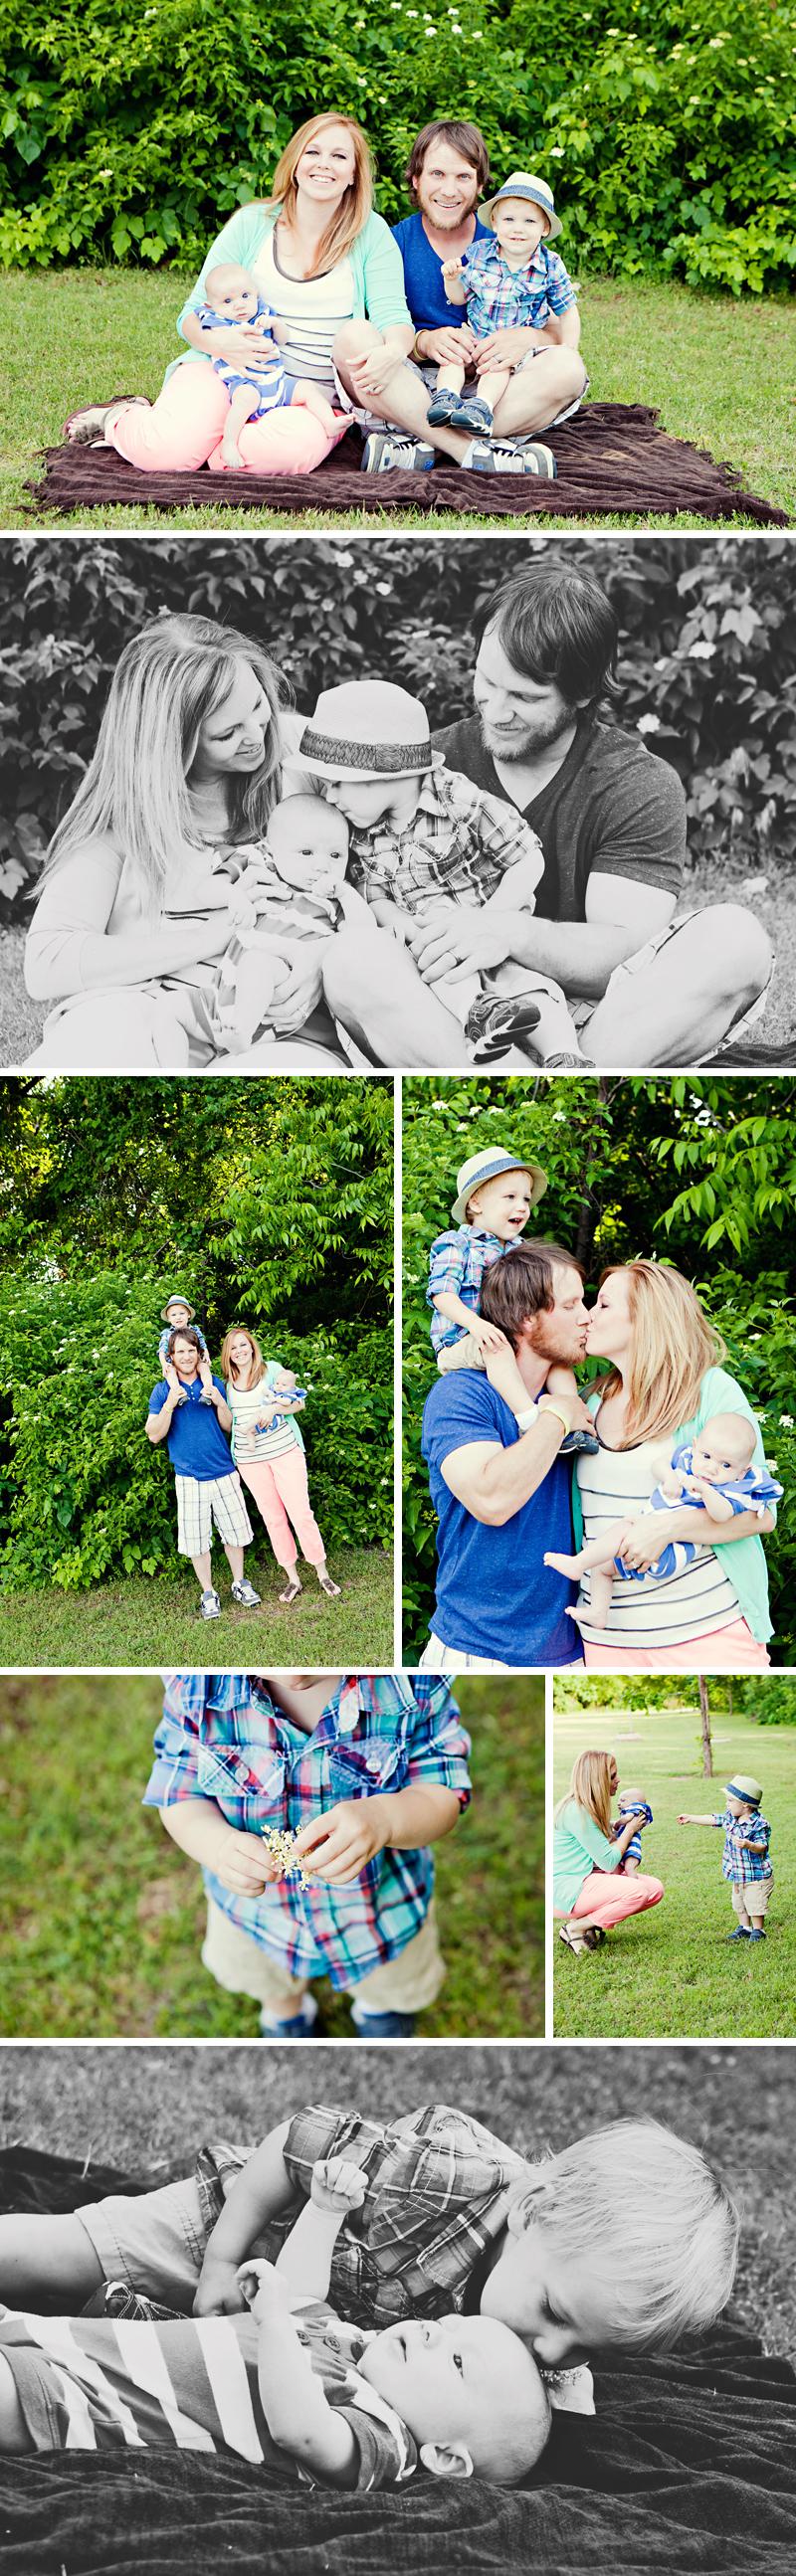 Dallas-Family-Photographerc030